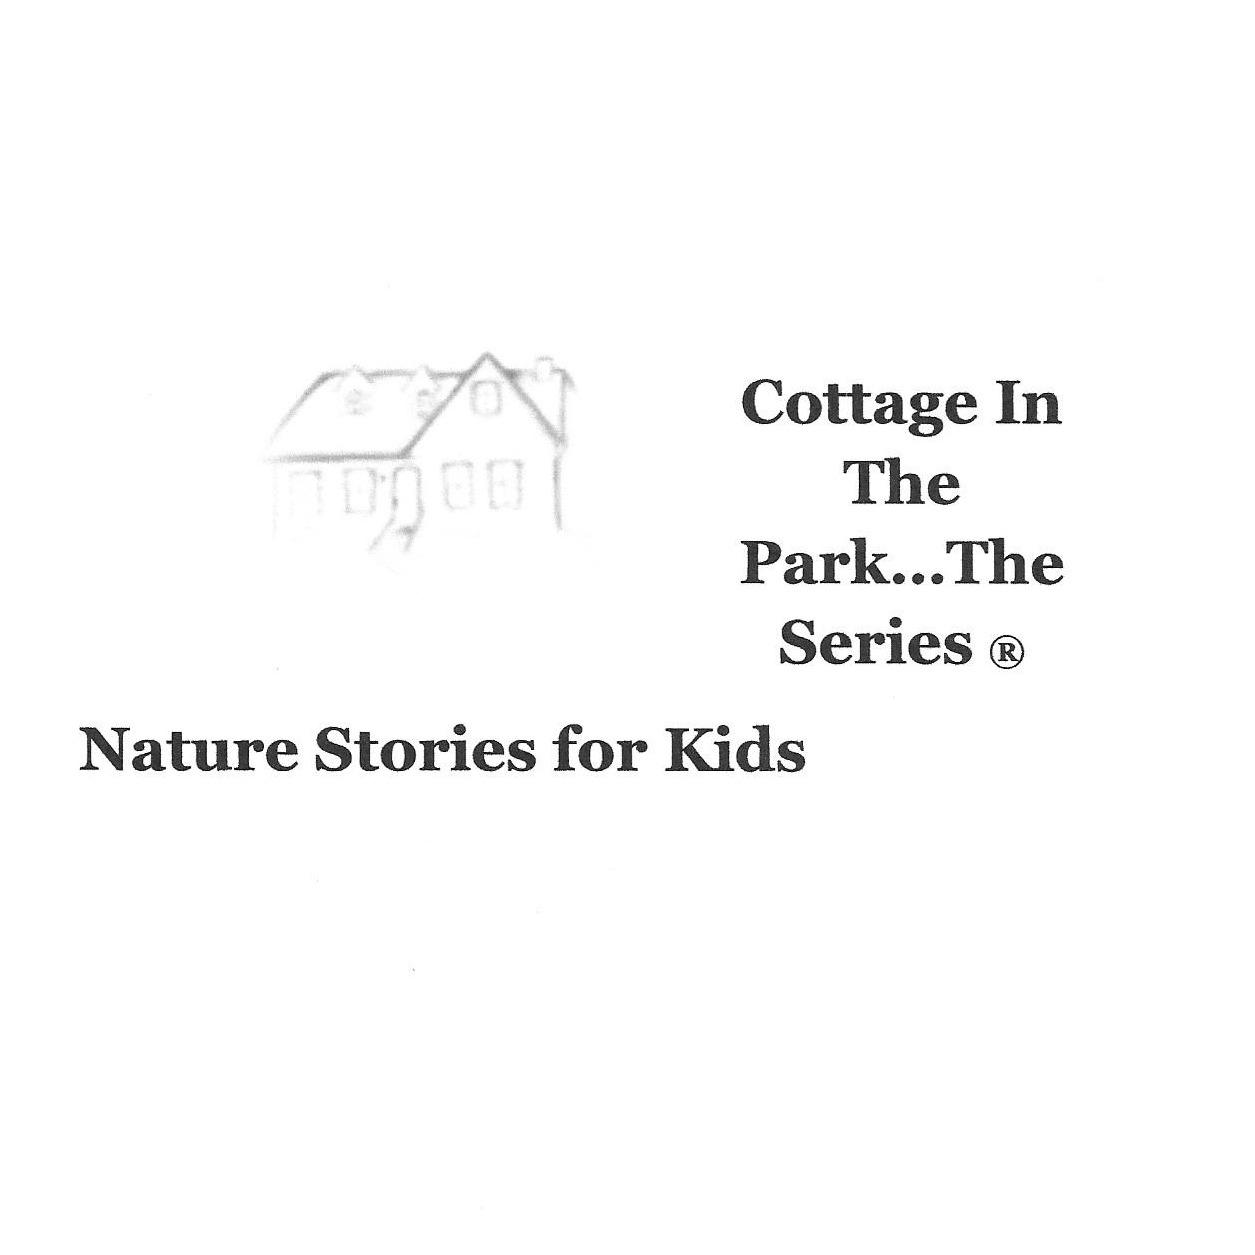 Cottage in the Park...The Series - Marietta, GA 30062 - (770)973-7362   ShowMeLocal.com